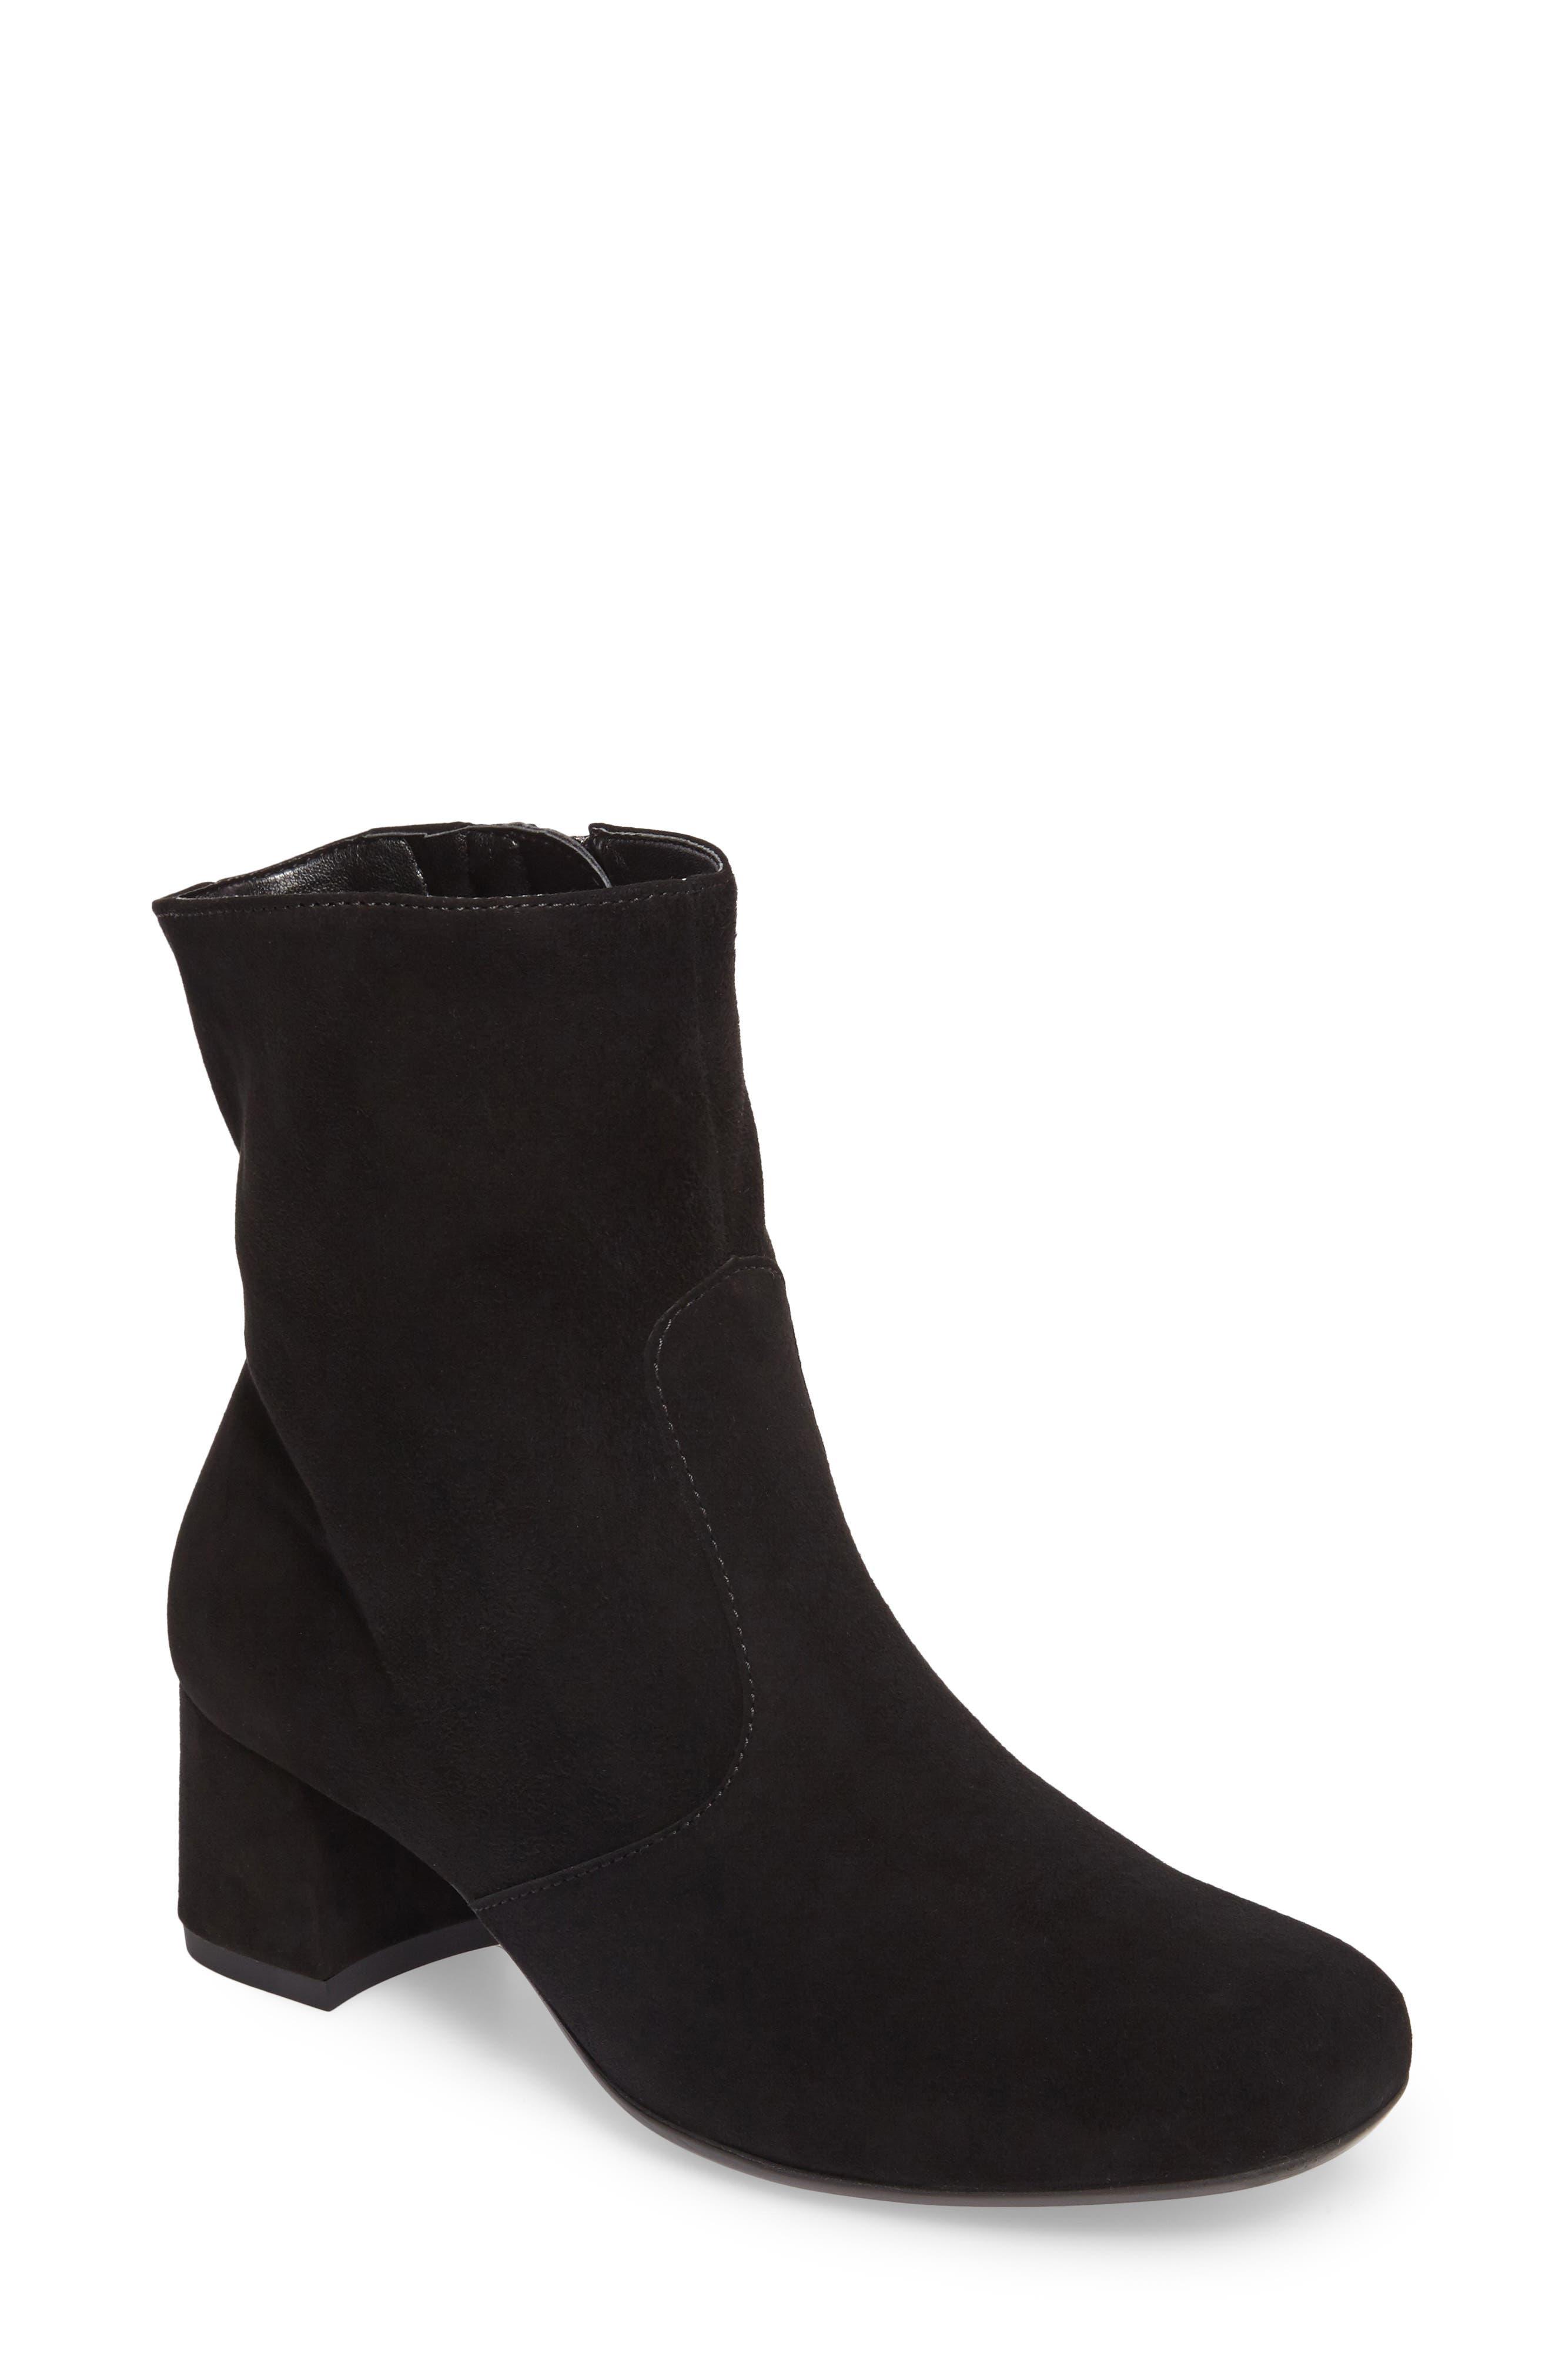 Alternate Image 1 Selected - ara Carter Sock Bootie (Women)